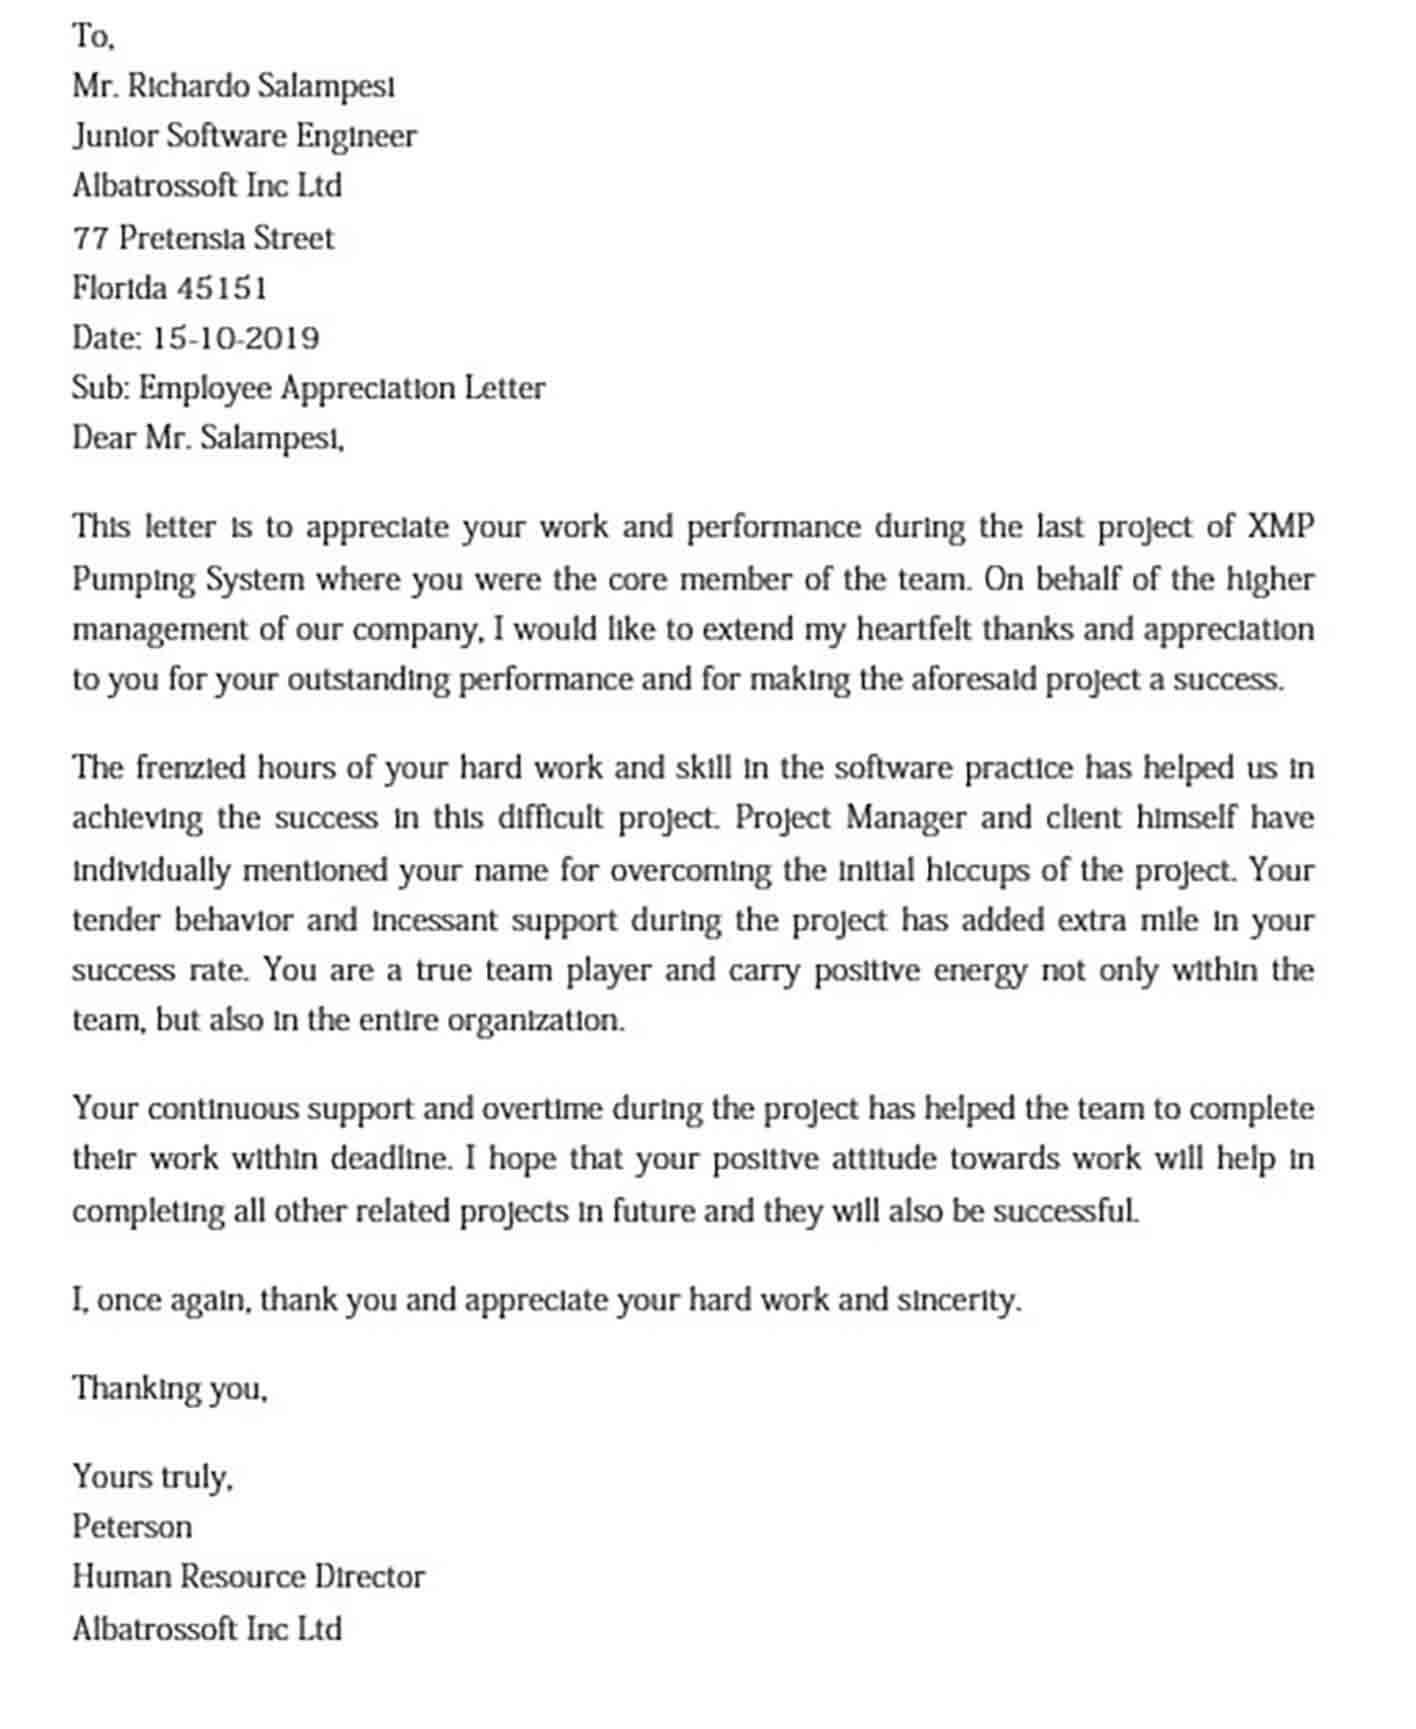 Employee Appreciation Letter Format DOC